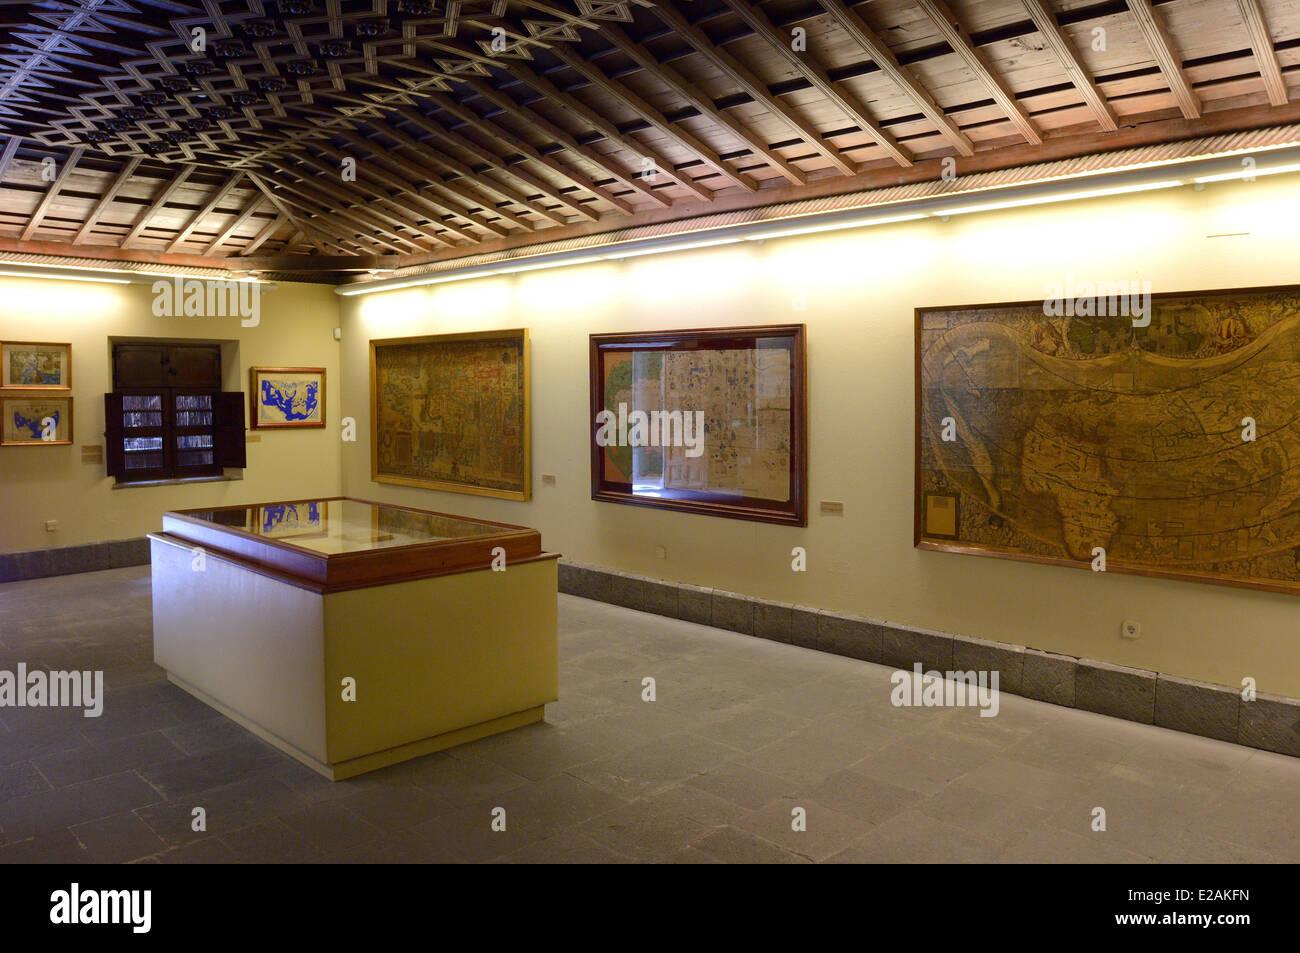 Map gran canaria stockfotos map gran canaria bilder alamy - Showroom las palmas ...